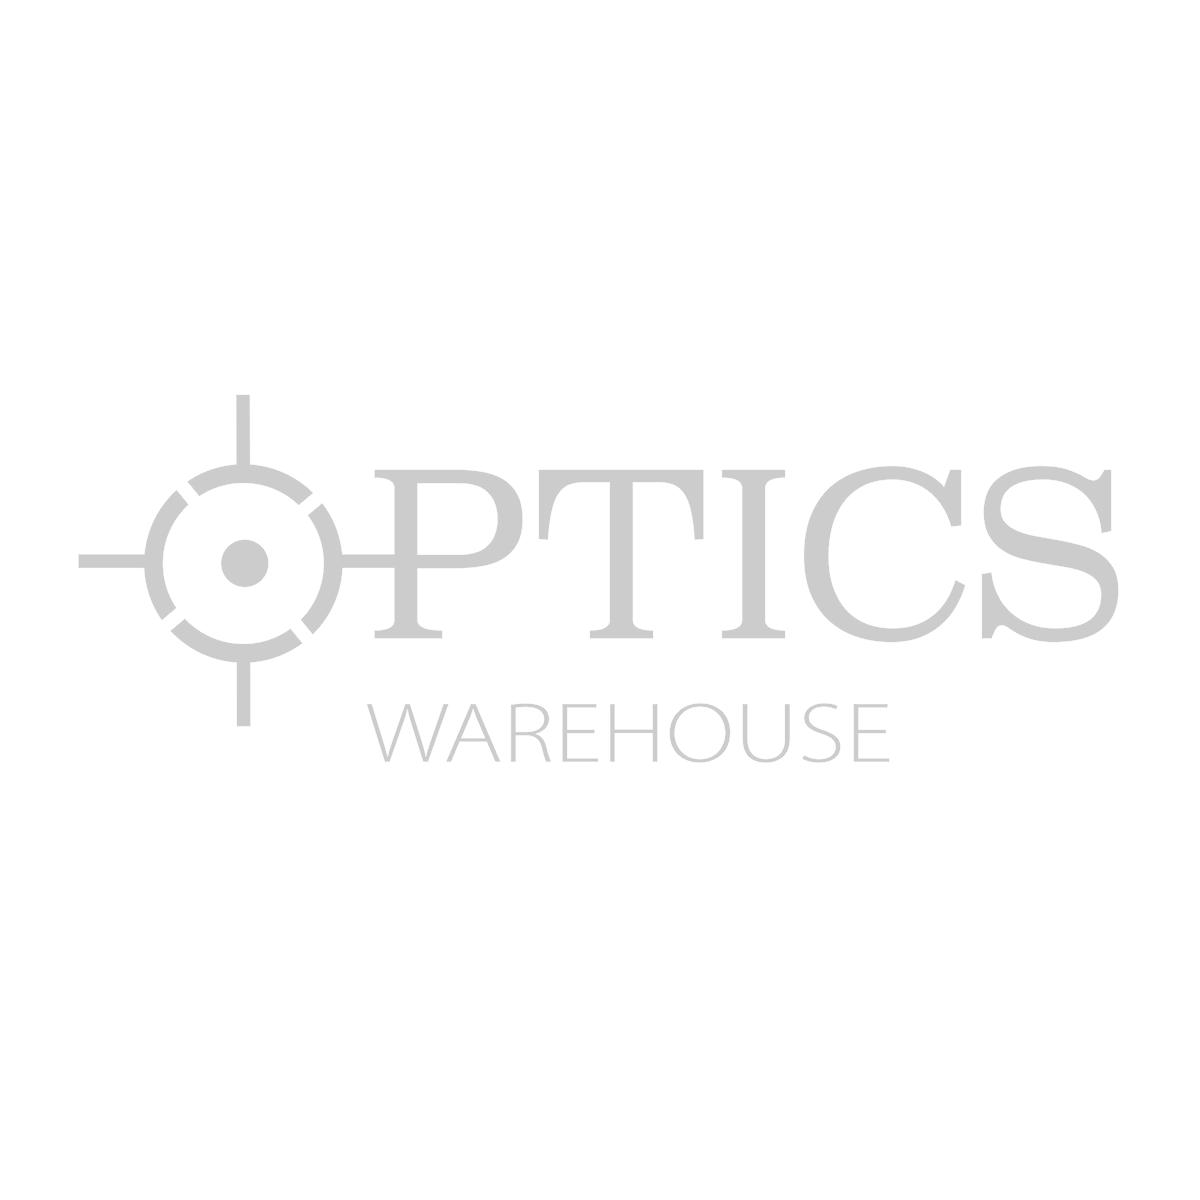 HIK Micro Owl Pro 35mm 35mK 640x512 17um Smart Thermal Monocular